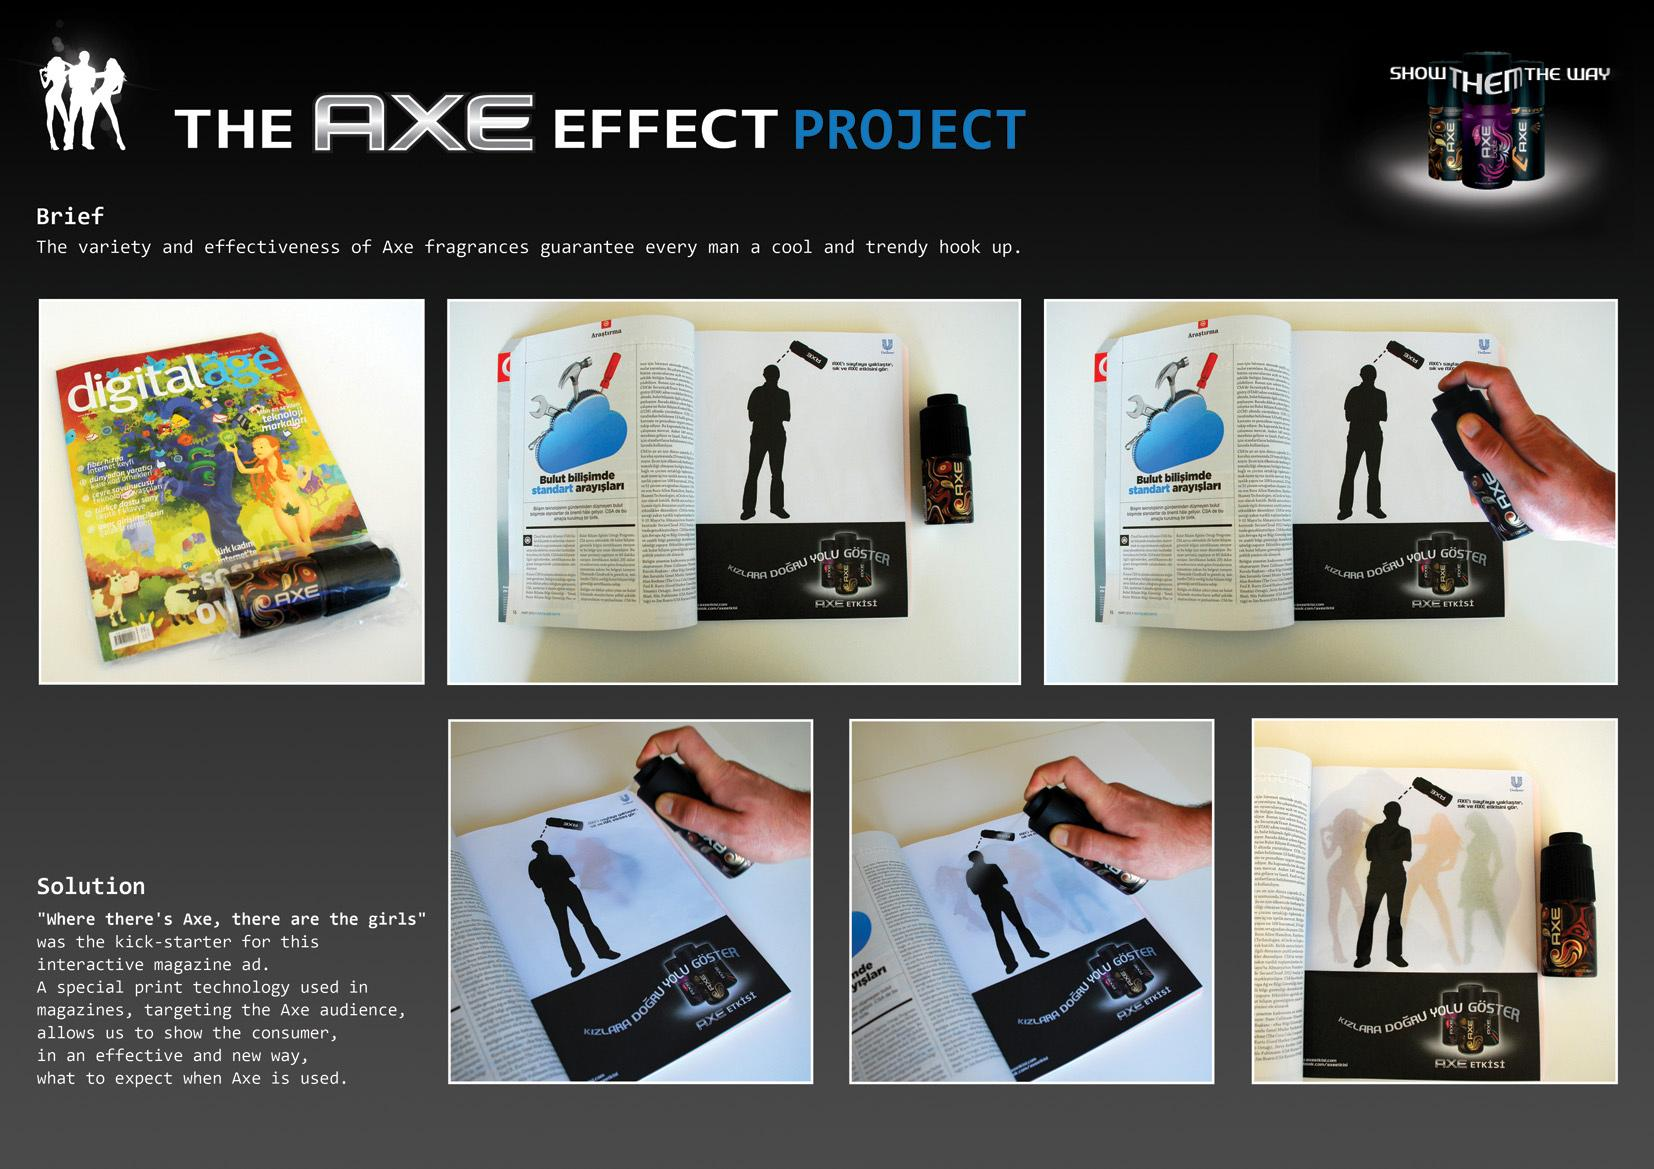 Axe_Effect_Project_ibelieveinadv.jpg (JPEG Image, 1654×1169 pixels)